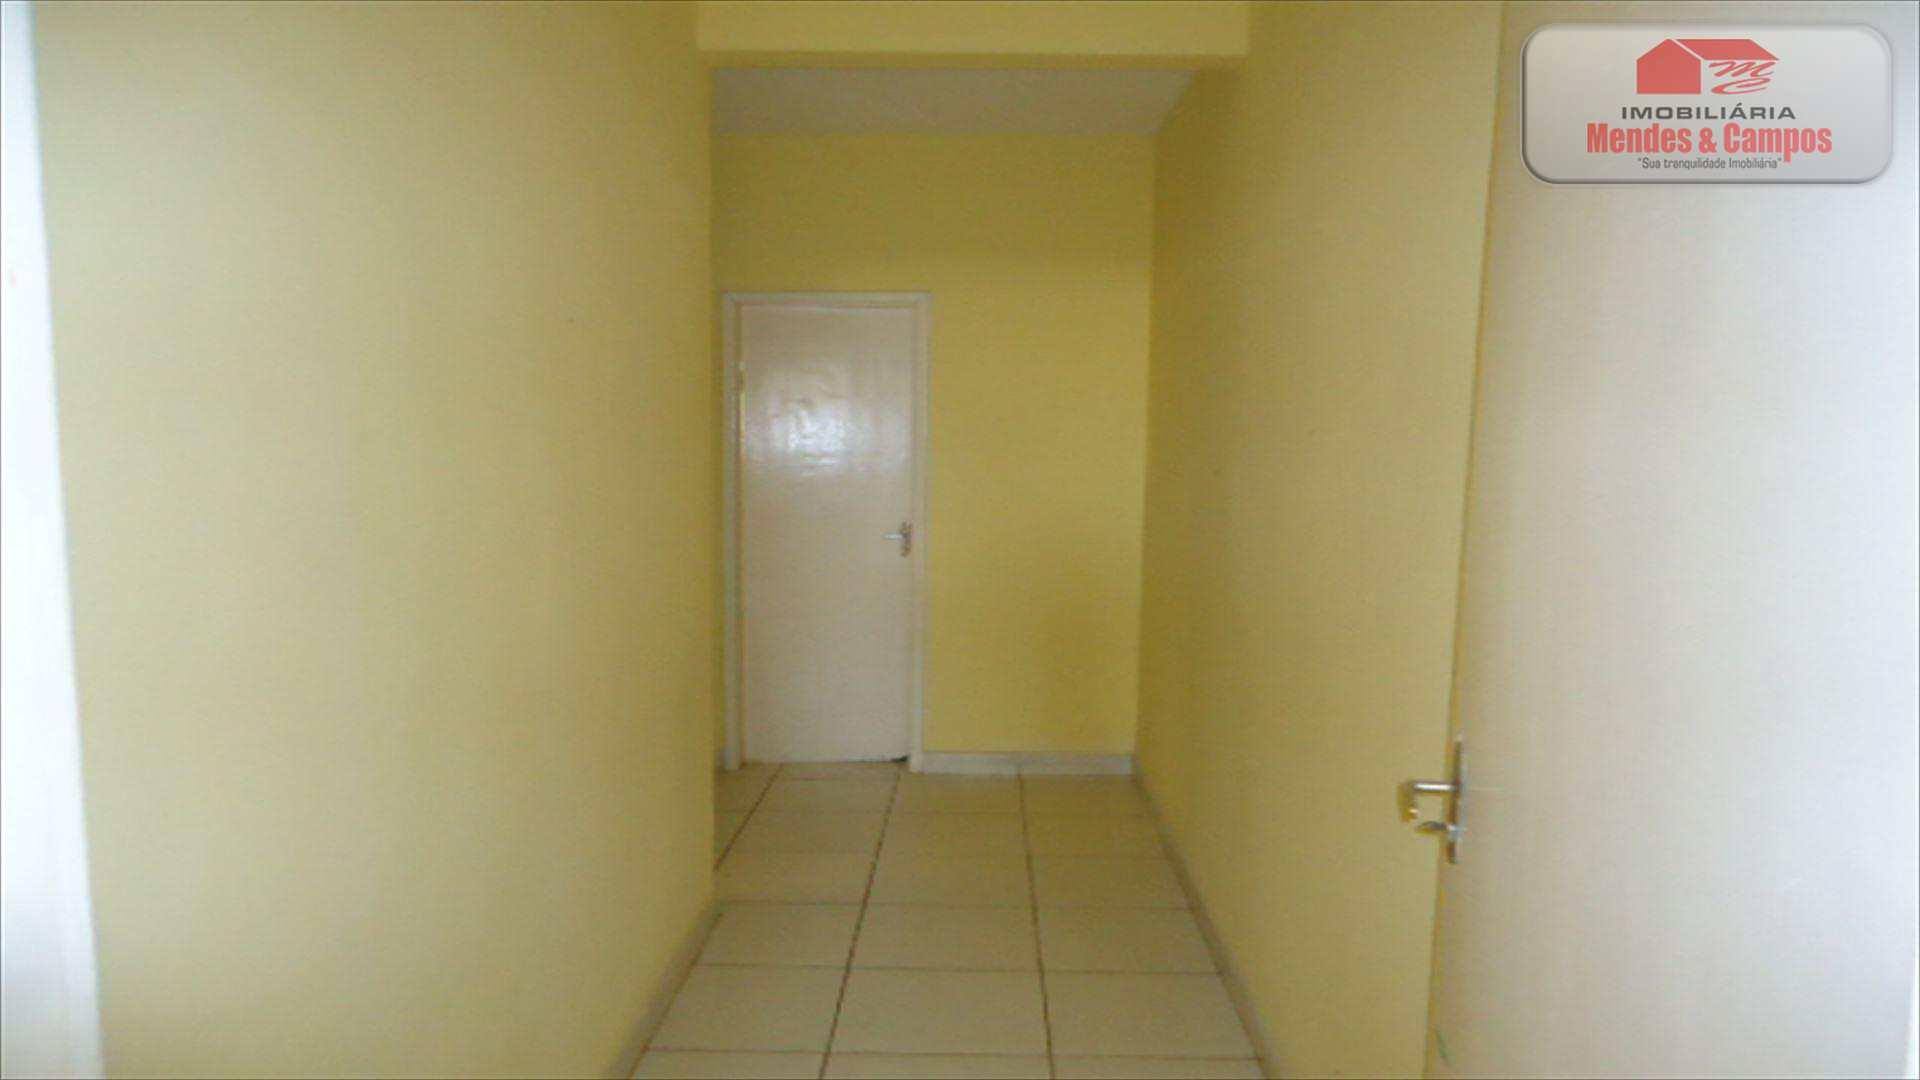 Rua Fortaleza nº 2099 Aptº 02 Setor 03, Cod:718